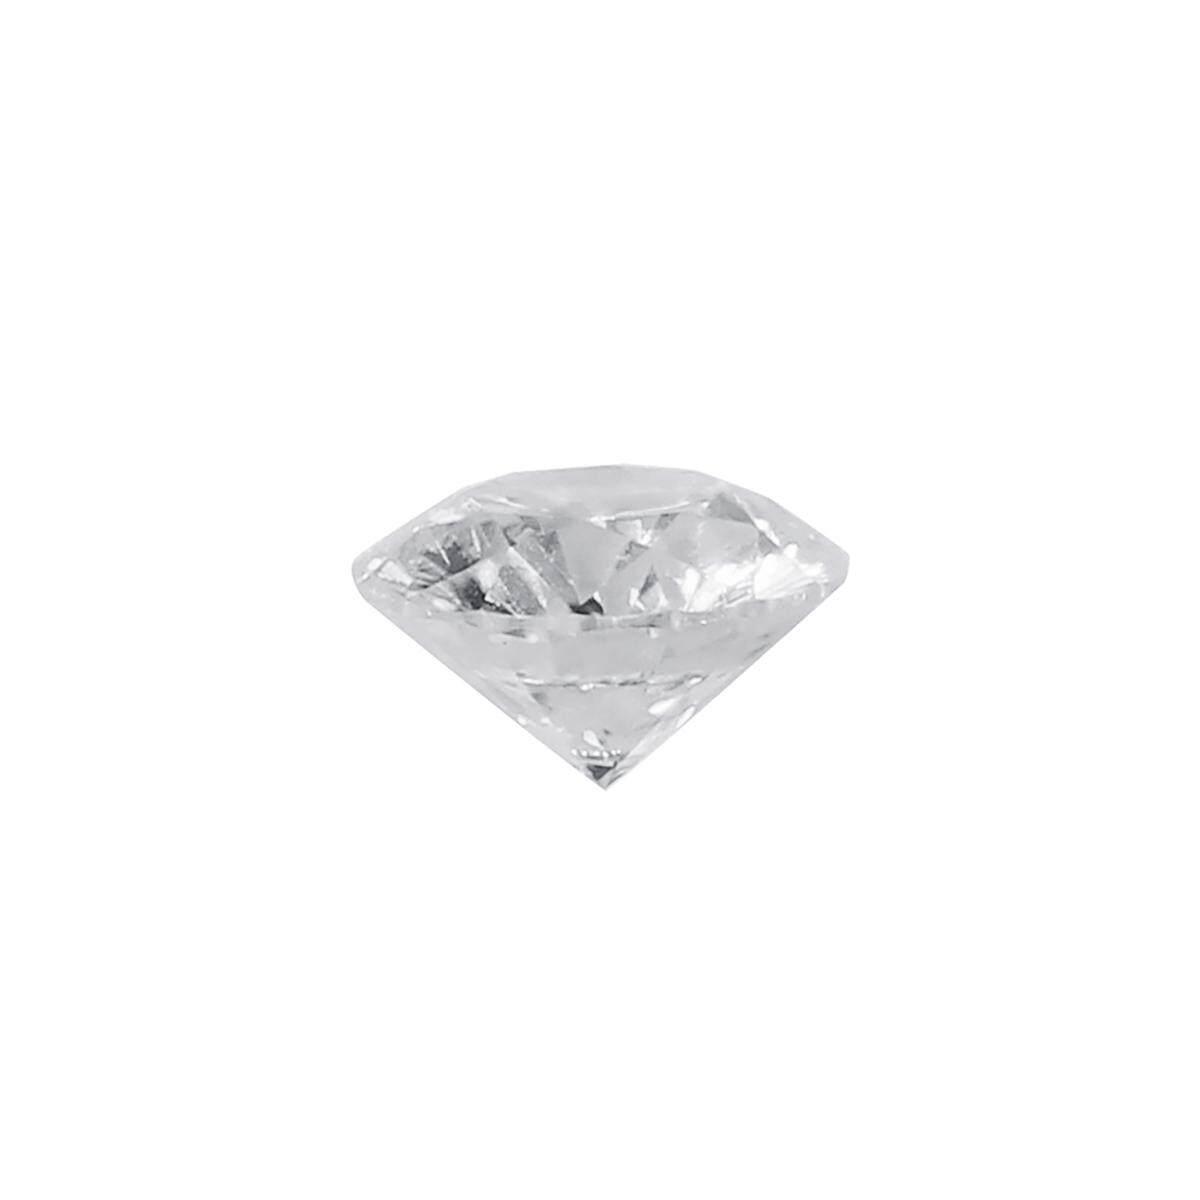 Berlian Putih Alami H Warna 1.0cts 6.5 Mm Bentuk Bulat Vvs2 Kejelasan 10 Kekerasan By Audew.